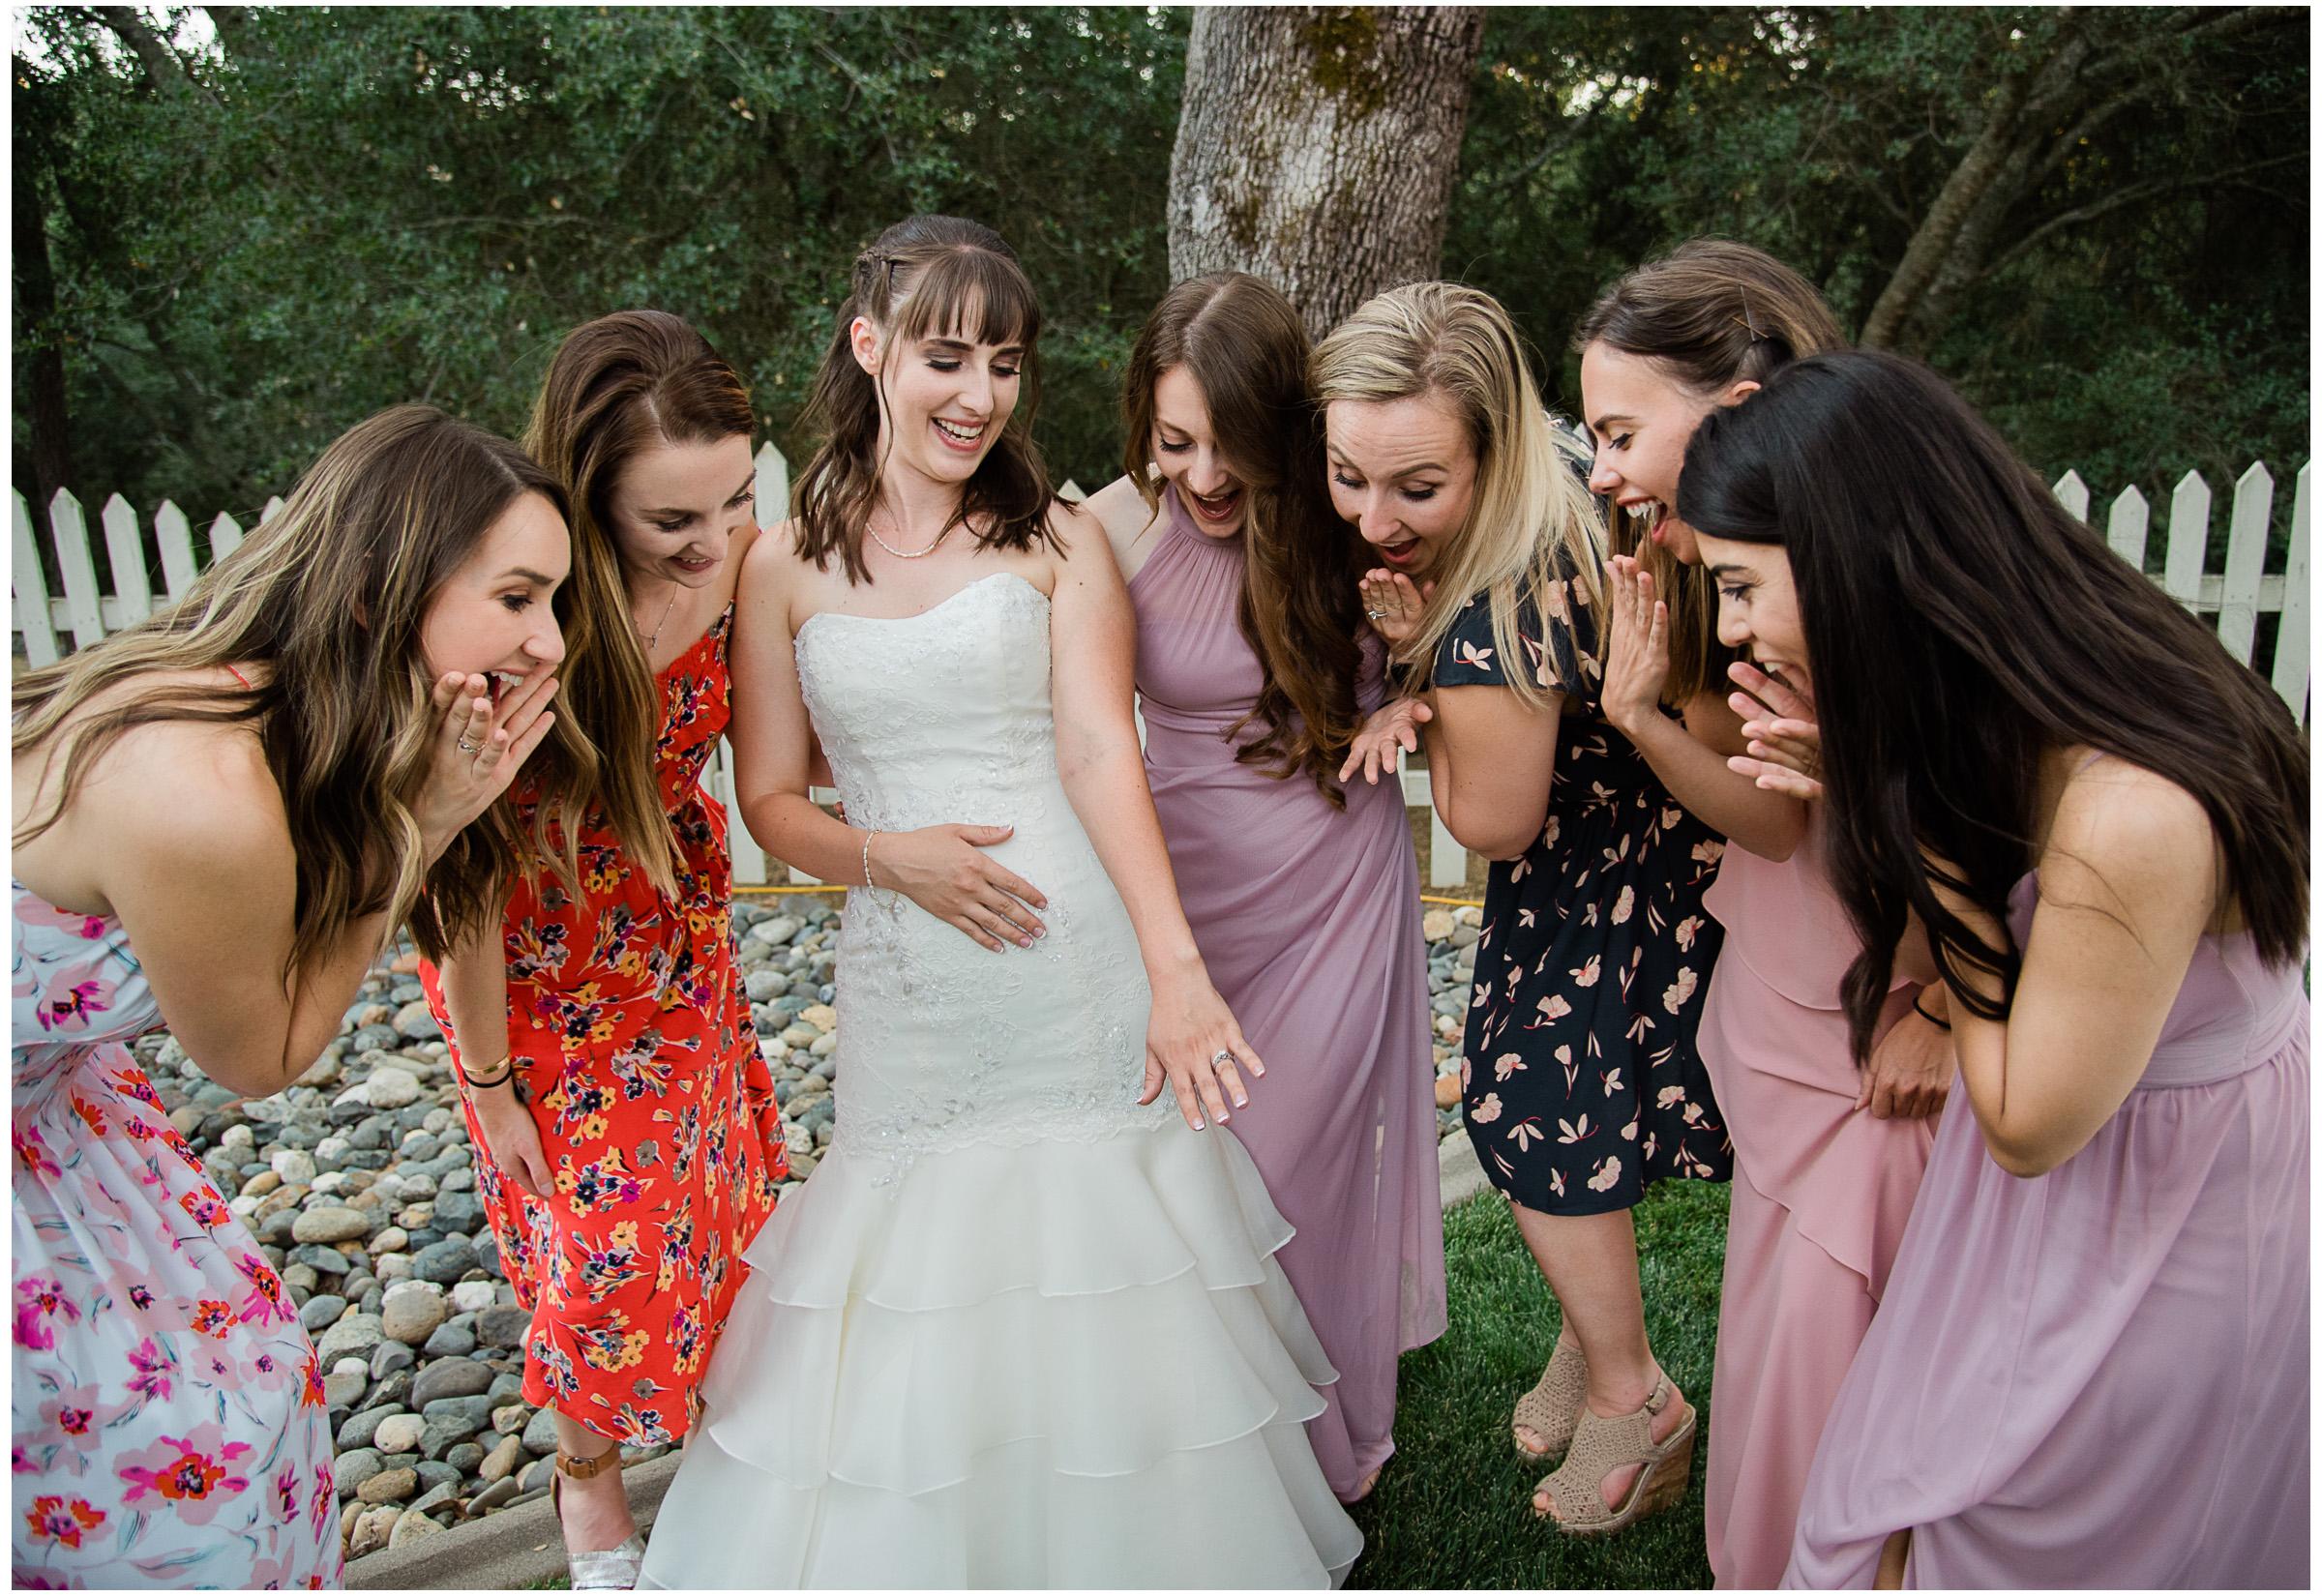 Placerville Wedding - Sacramento Photographer - Justin Wilcox Photography - 20.jpg